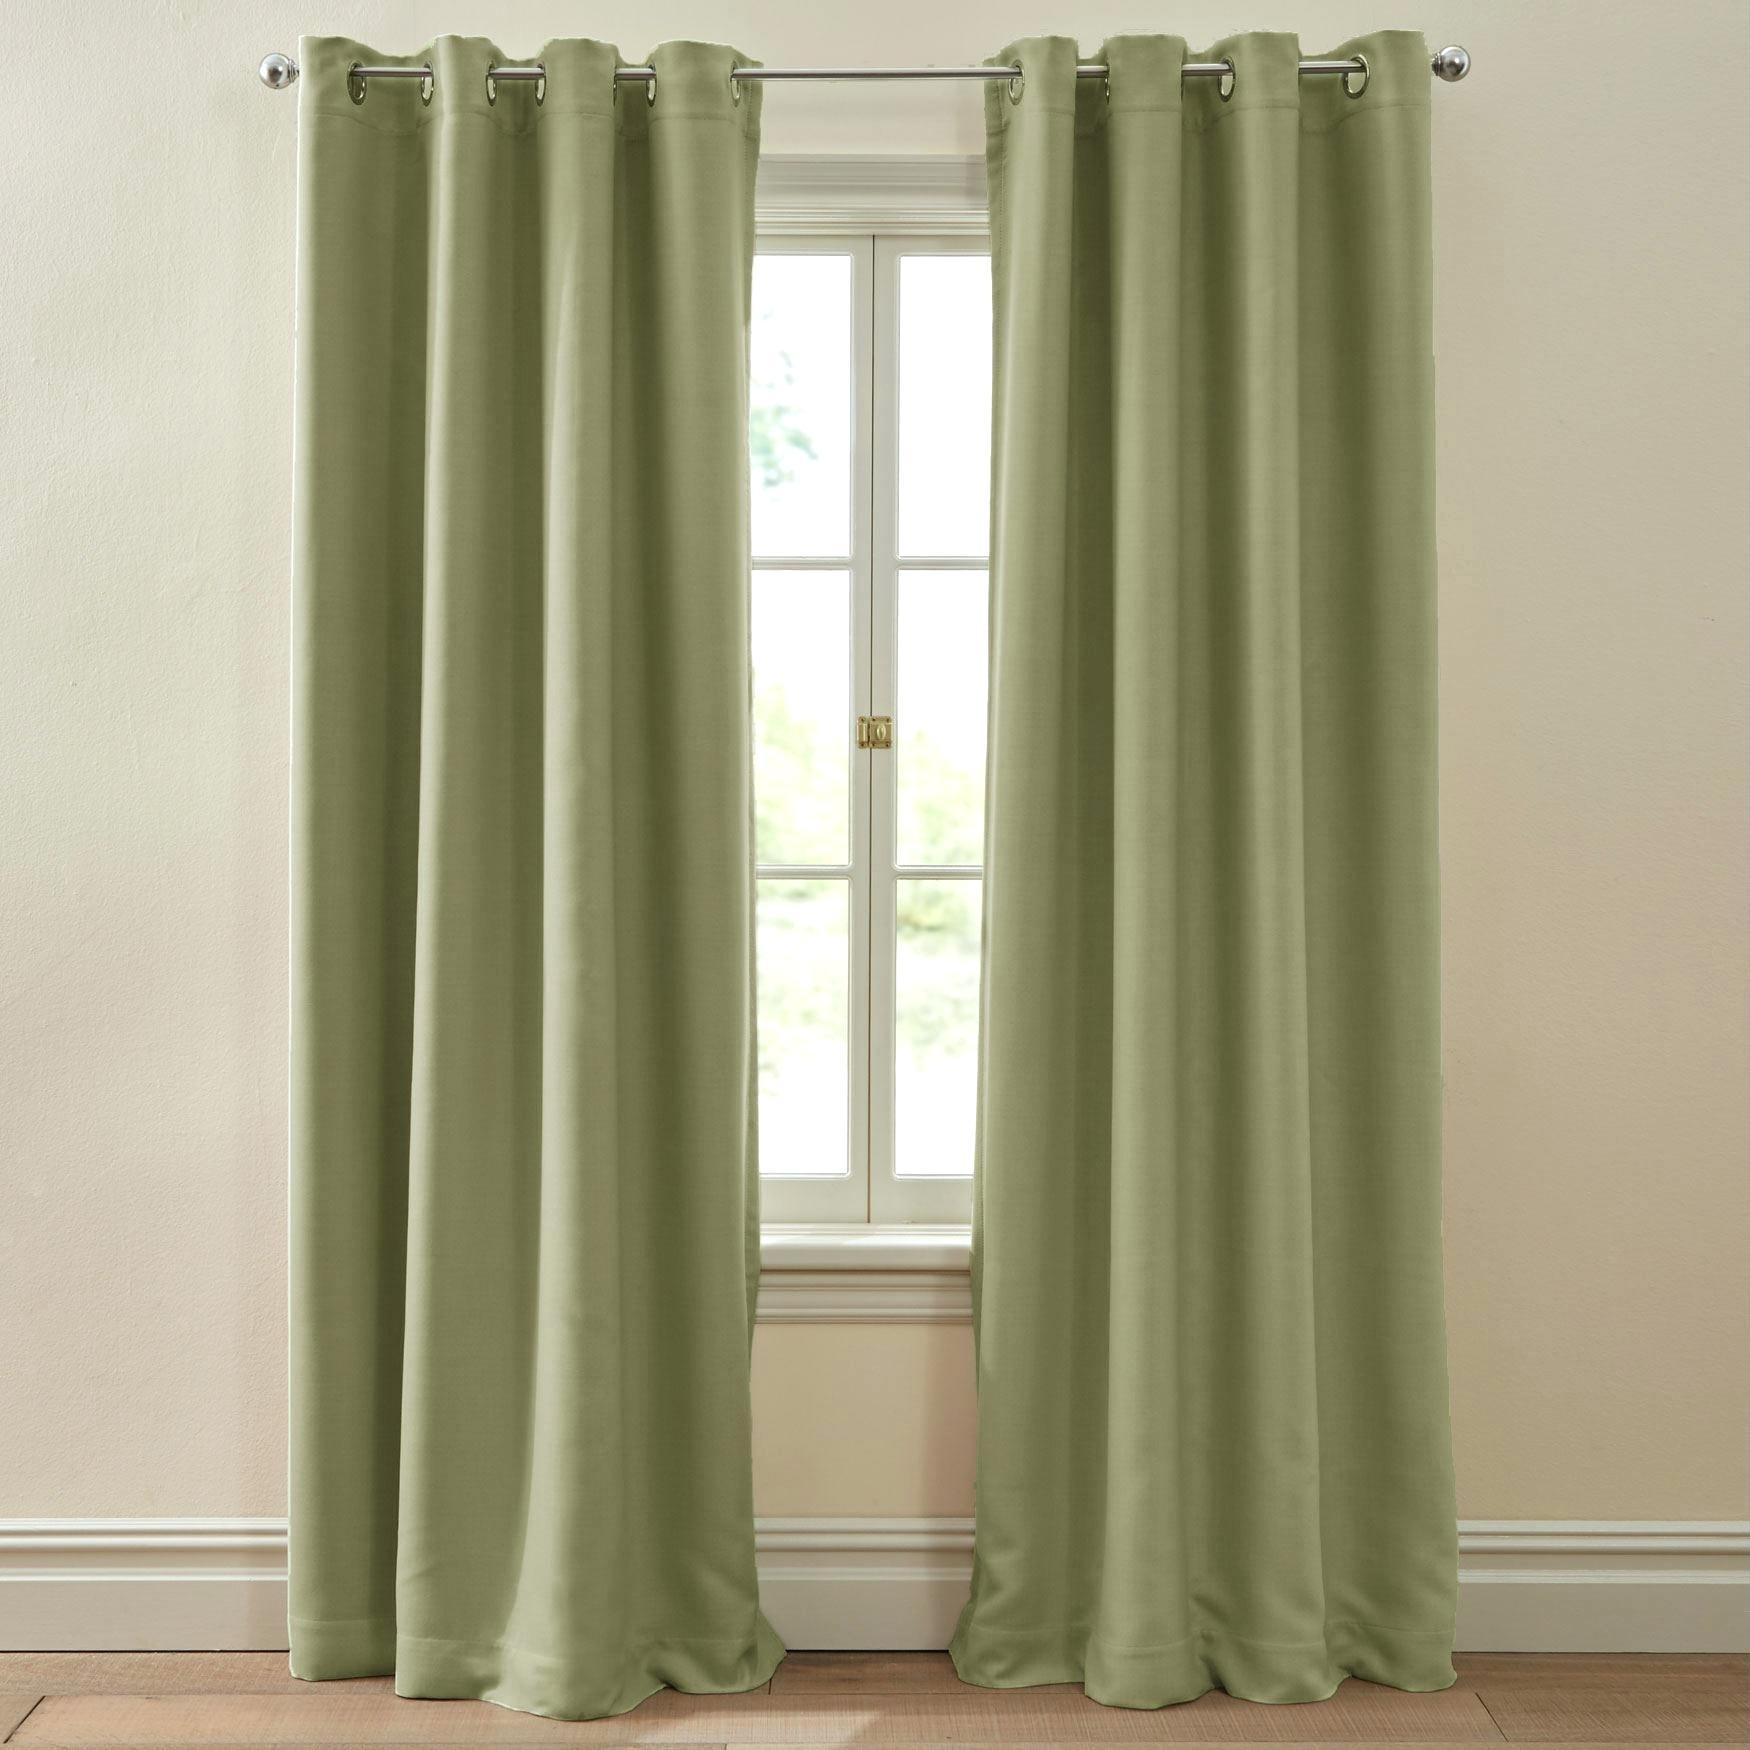 Gromet Panel Curtains – Bshteam.co intended for Ultimate Blackout Short Length Grommet Panels (Image 11 of 30)